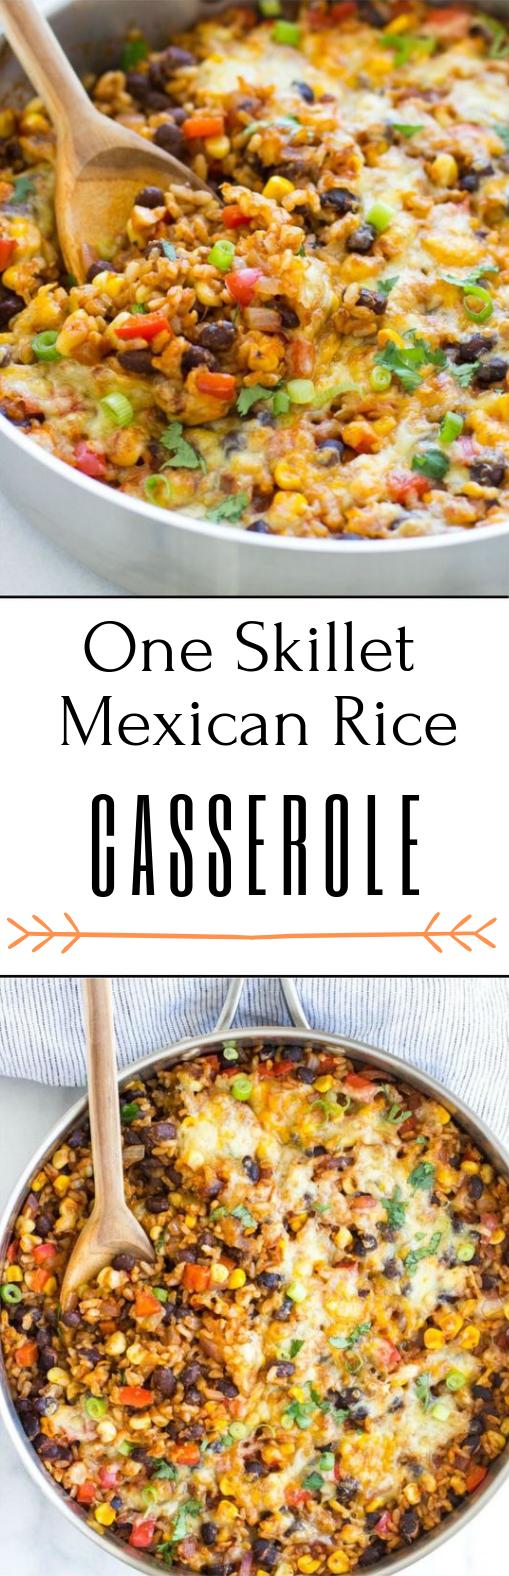 ONE SKILLET MEXICAN RICE CASSEROLE #dinner #casserole